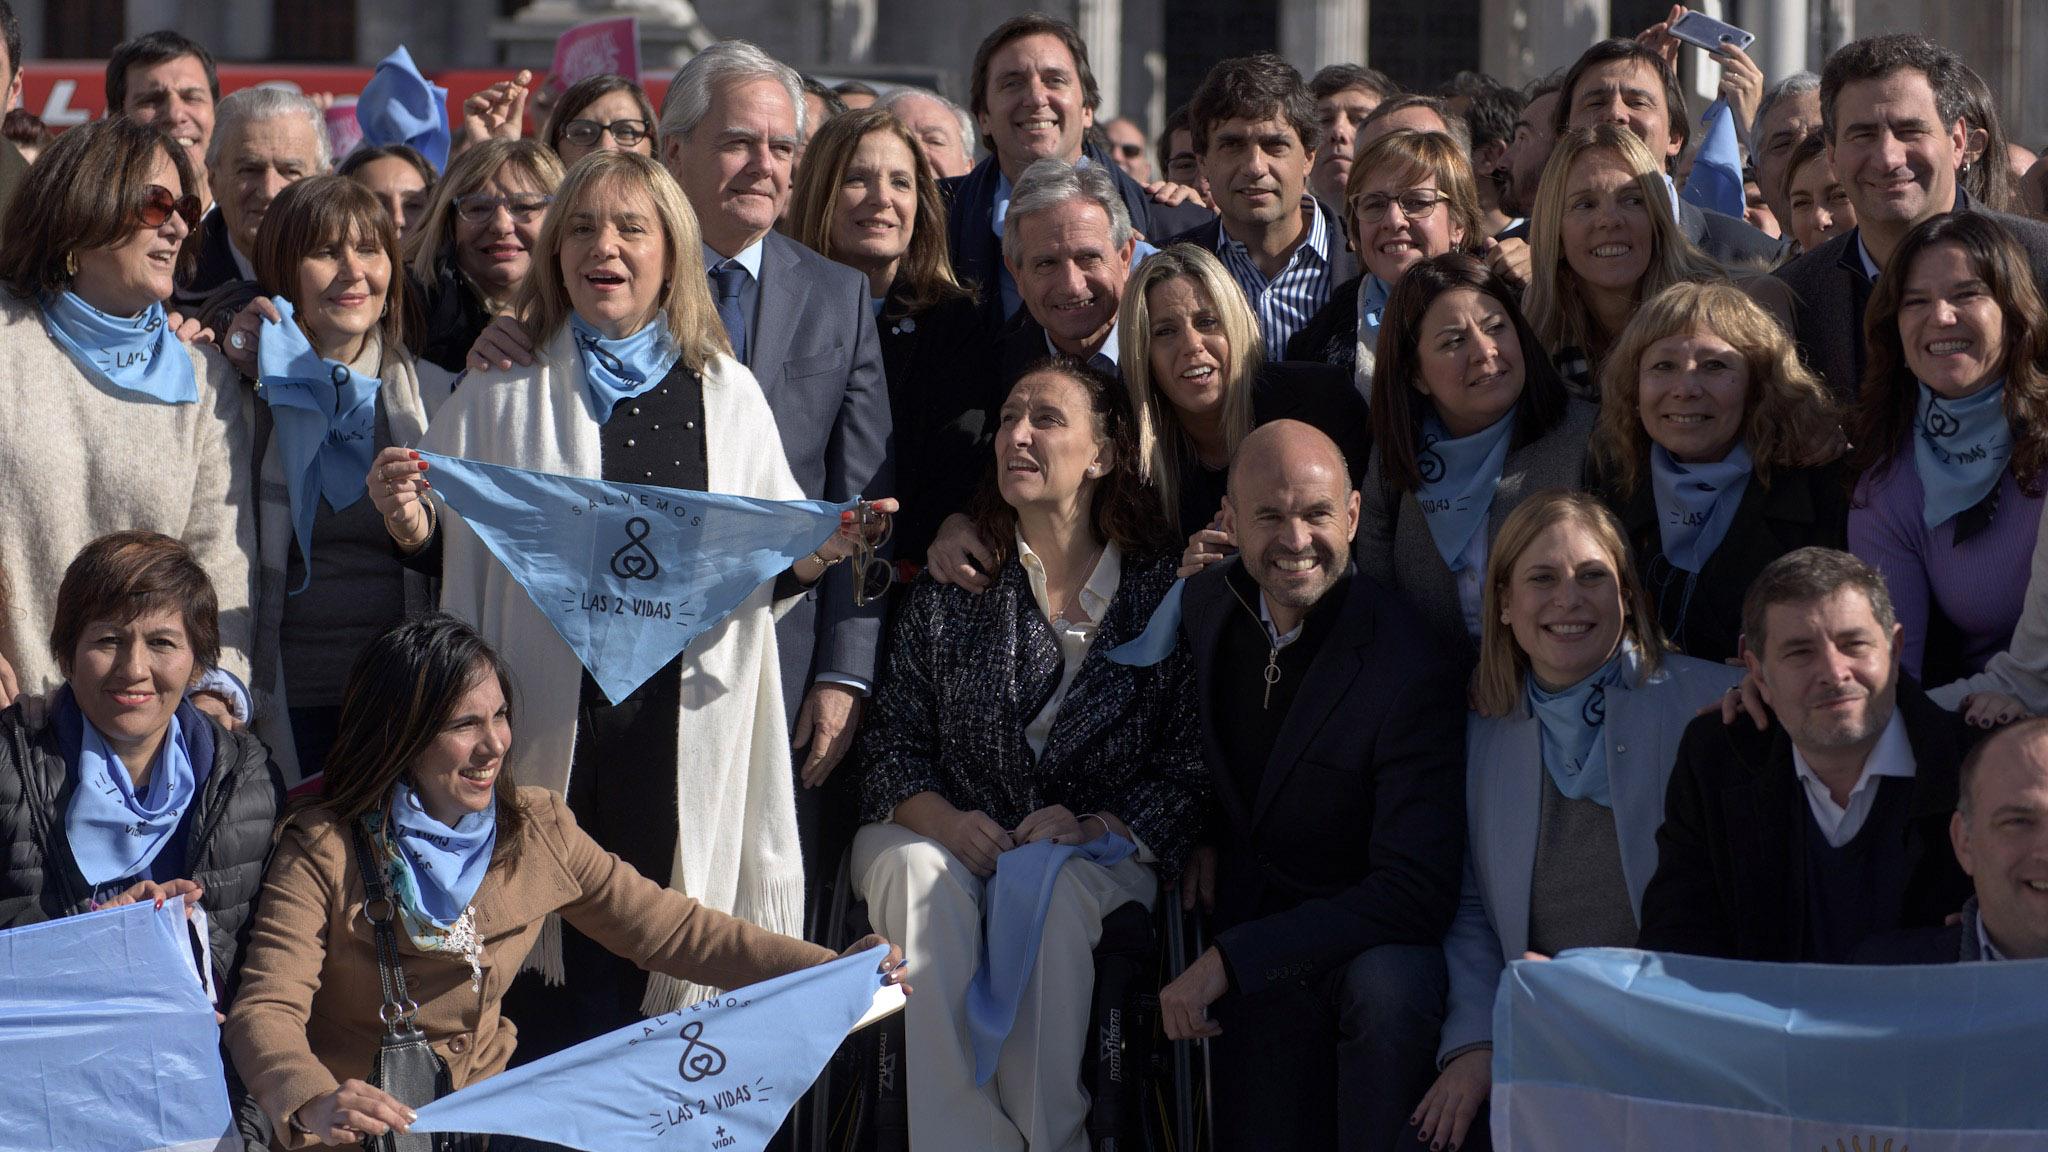 Gabriela Michetti se mostró muy emocionada durante el evento